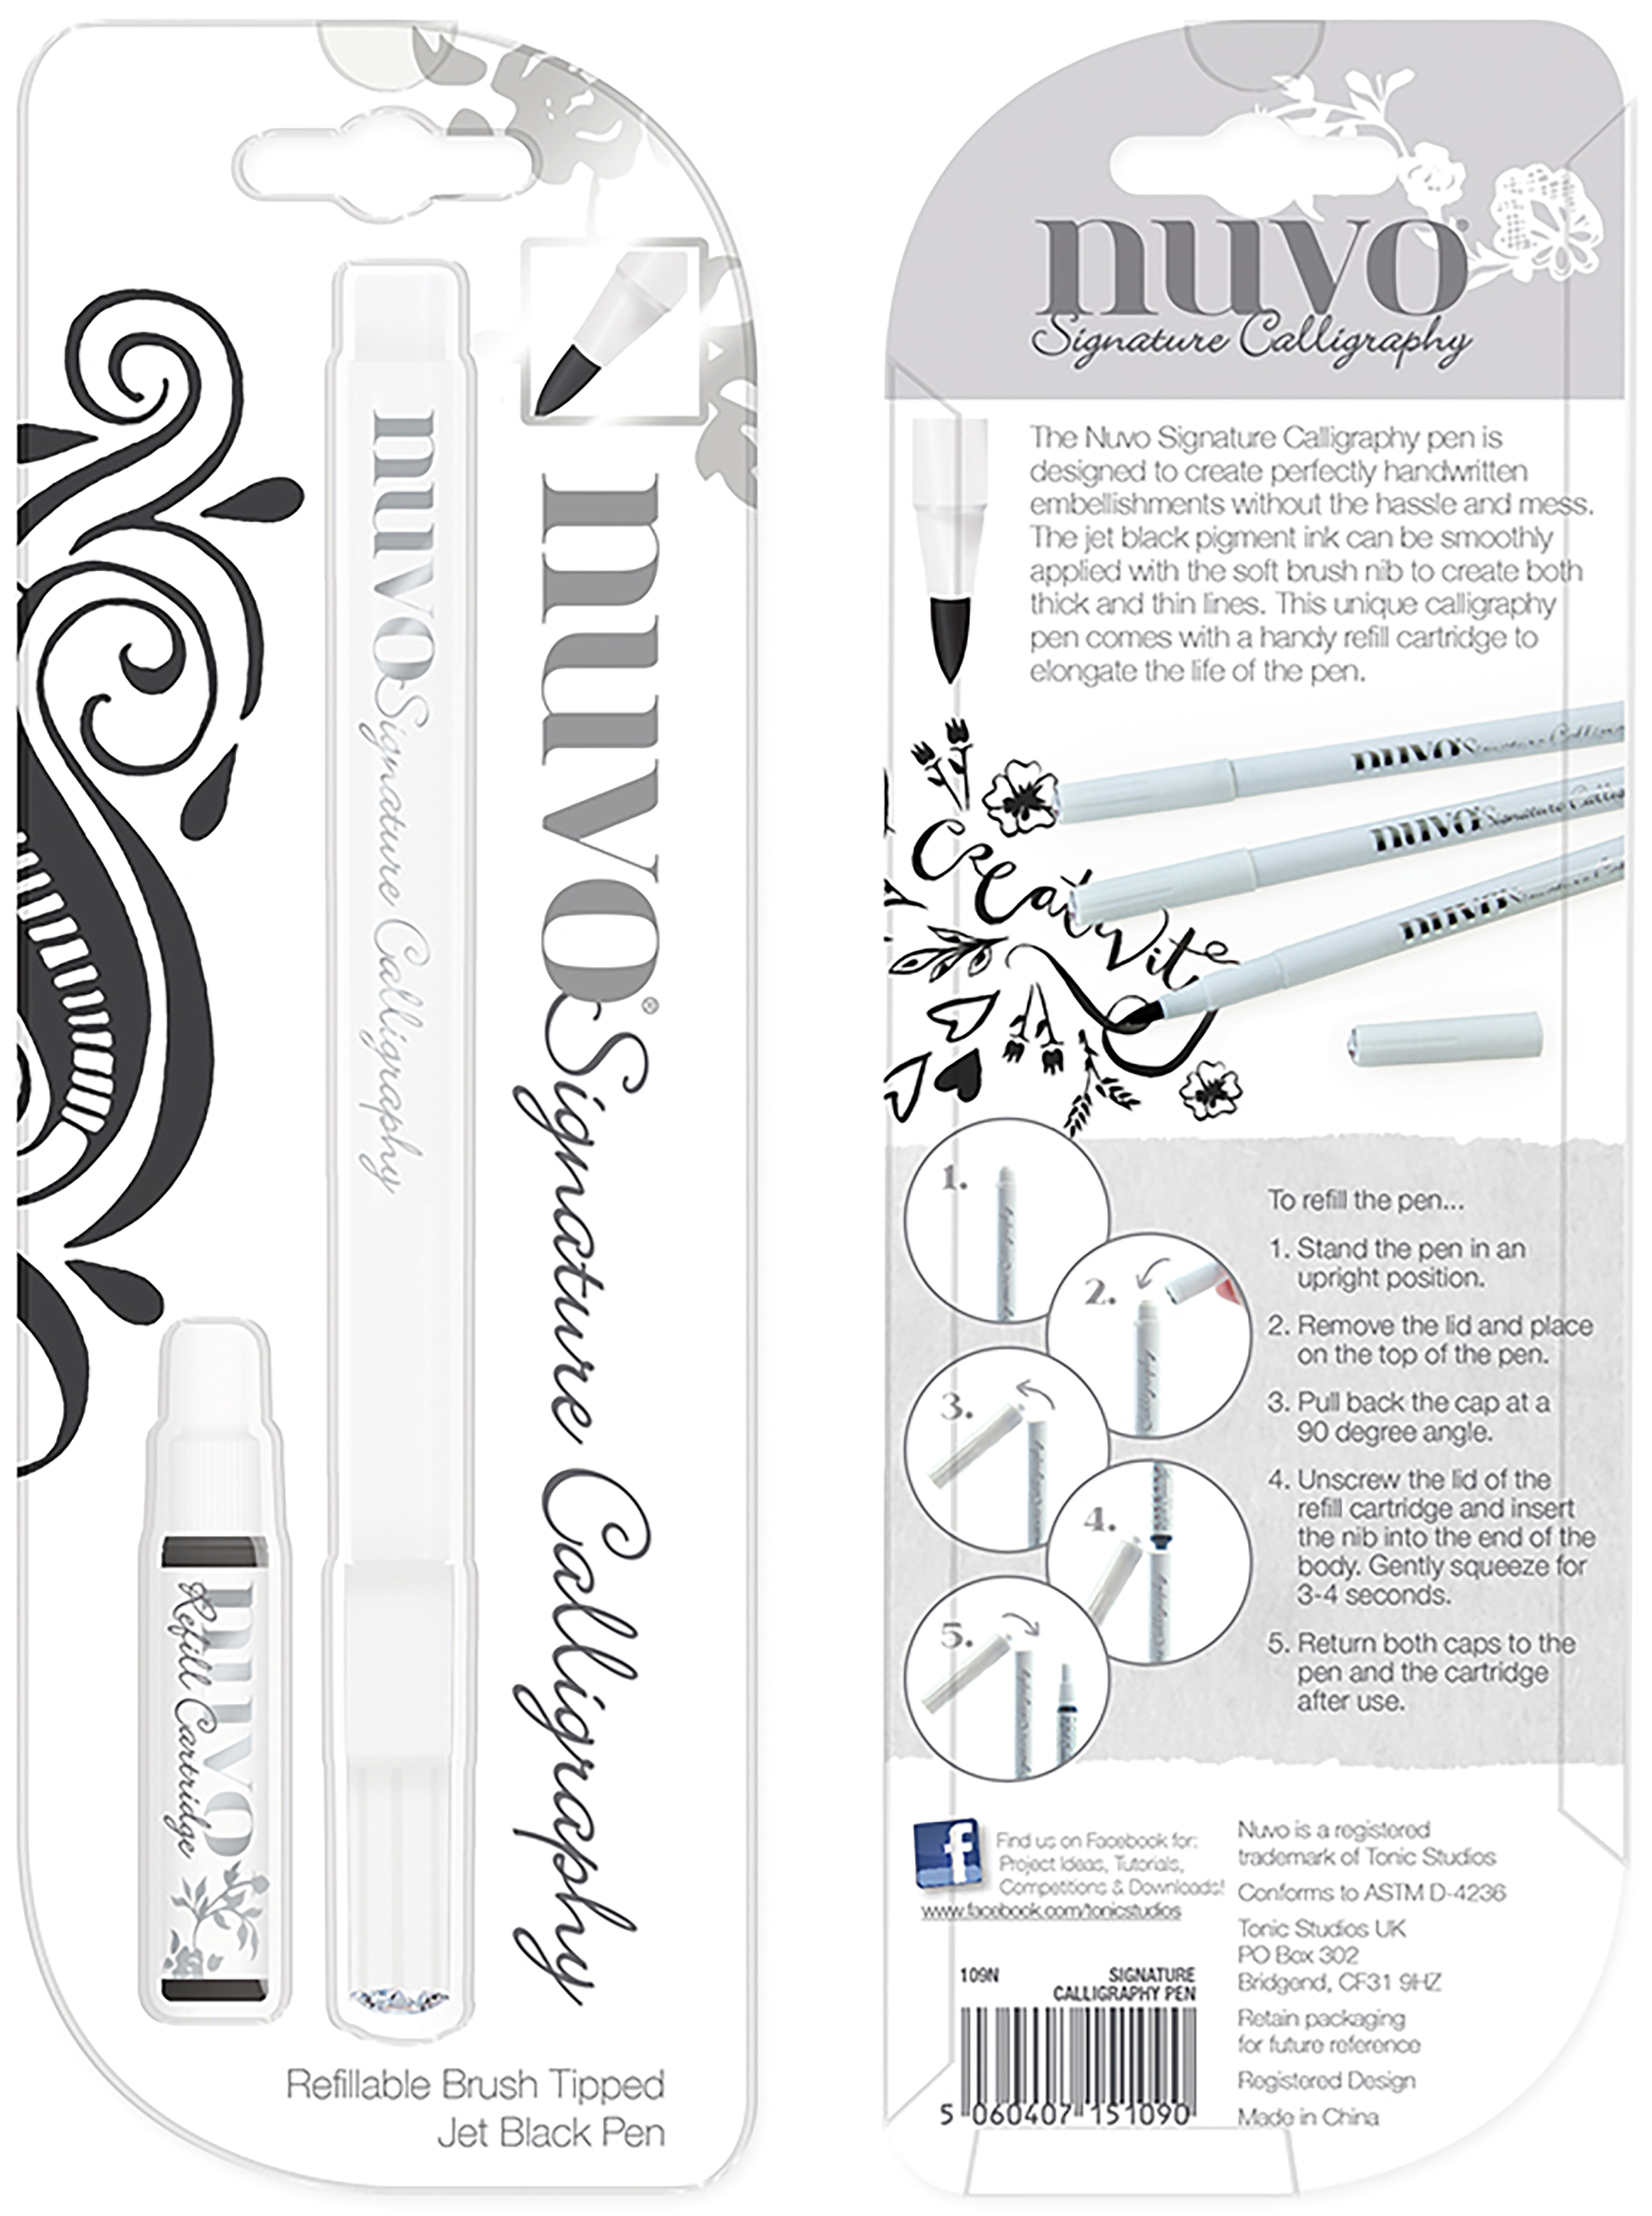 Nuvo Signature Calligraphy Pen-